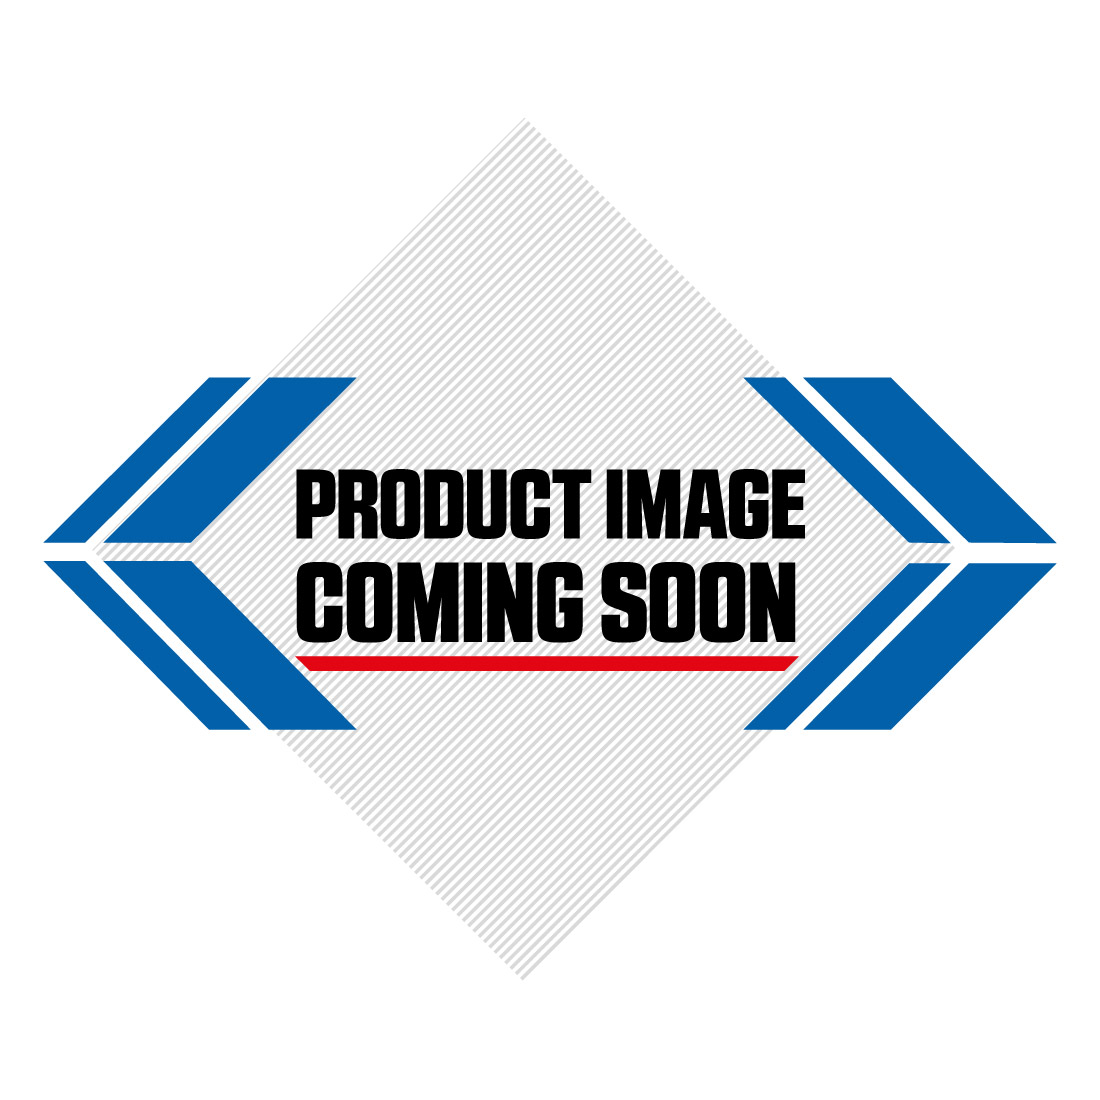 Suzuki Plastic Kit RMZ 450 (11-12) OEM Factory Image-2>